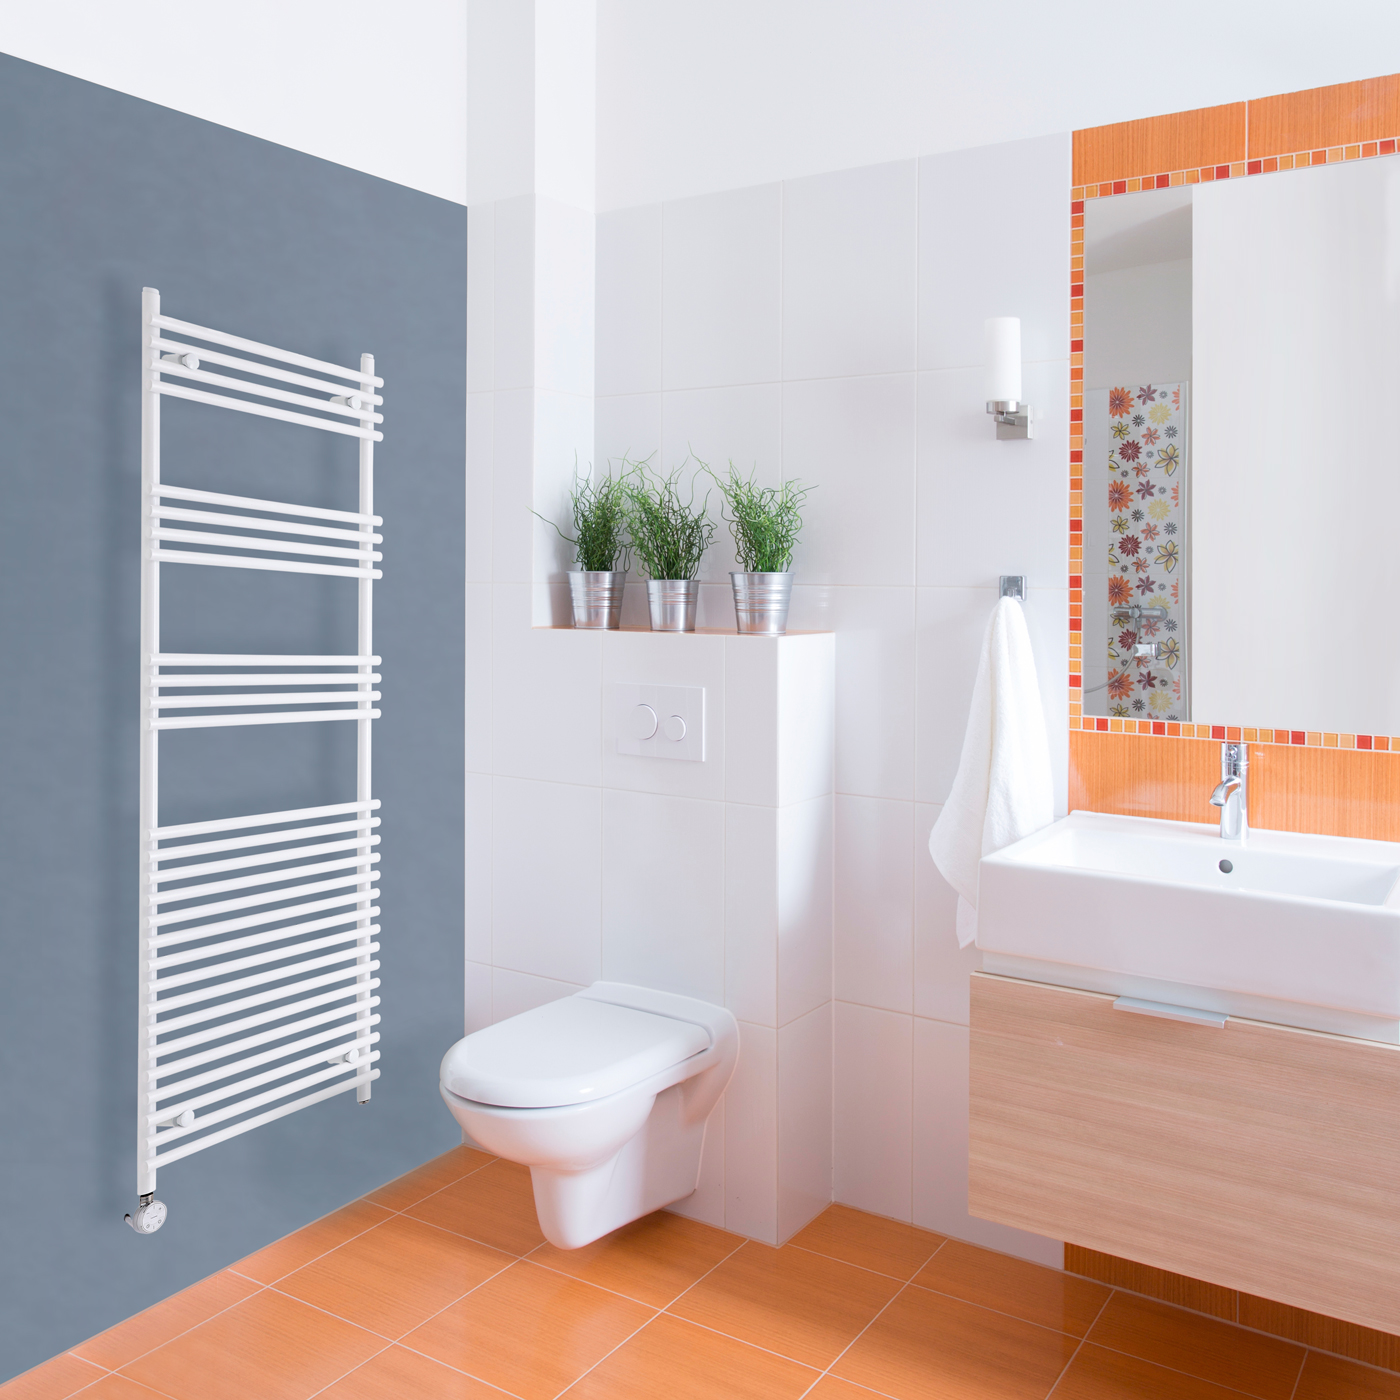 Kudox Harrogate Electric - White Flat Bar on Bar Heated Towel Rail - 1650mm x 600mm